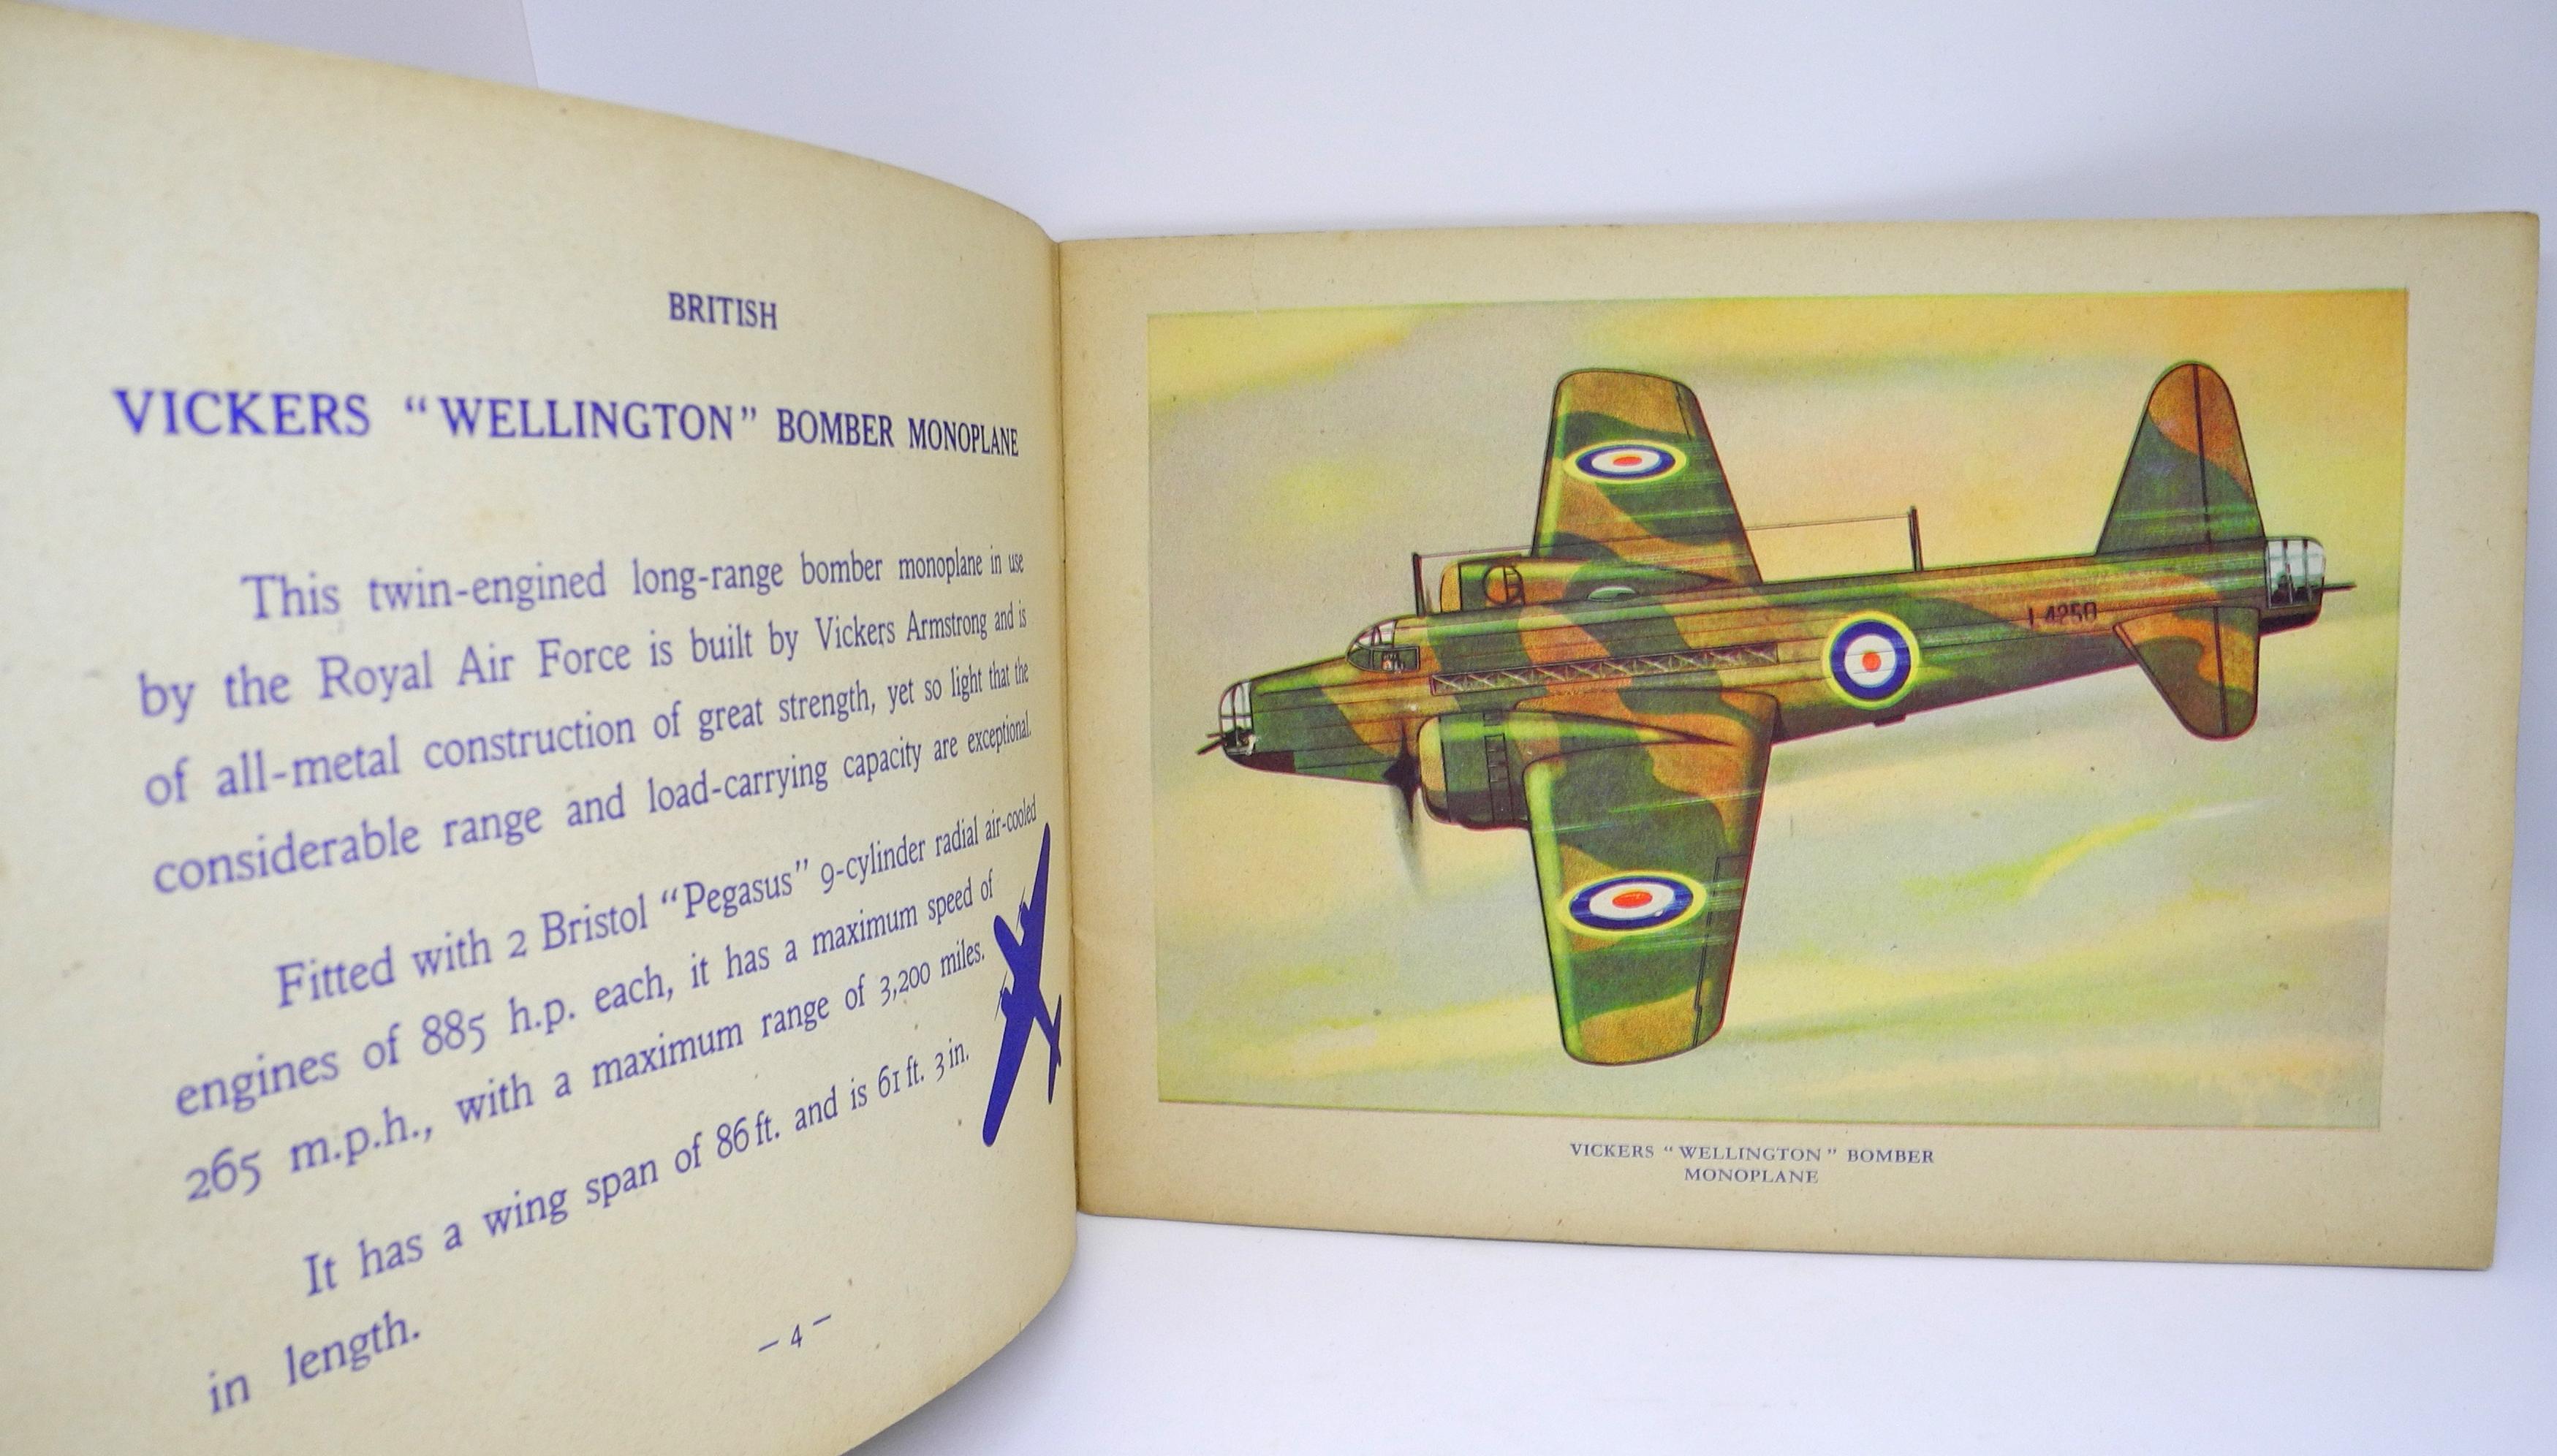 DSCN17Children's book of WWII BOMB40